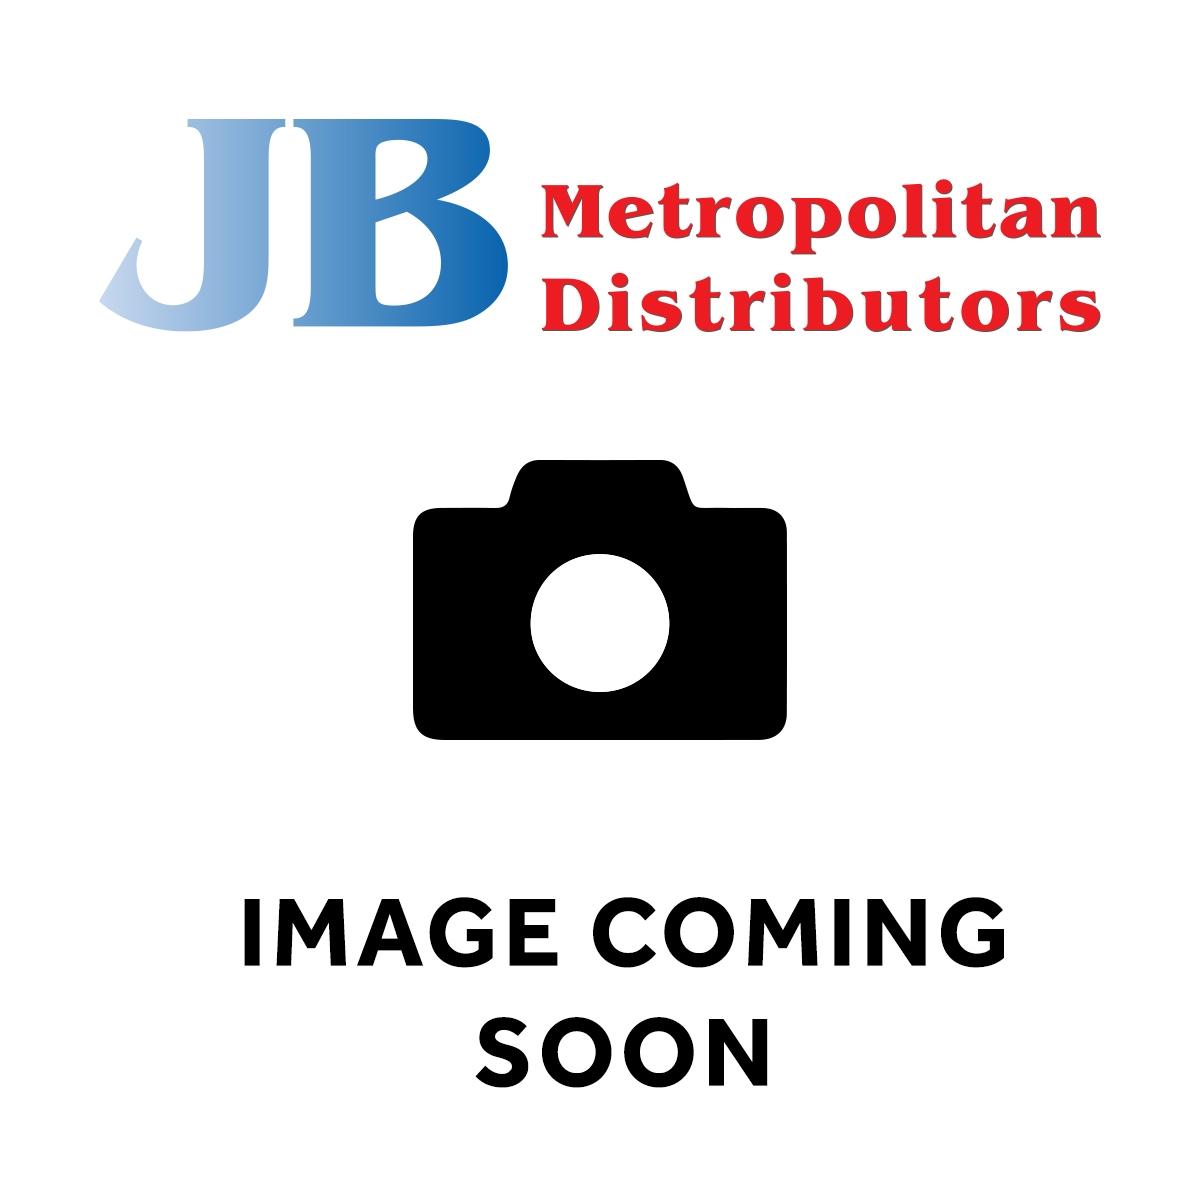 45G BURGER RINGS